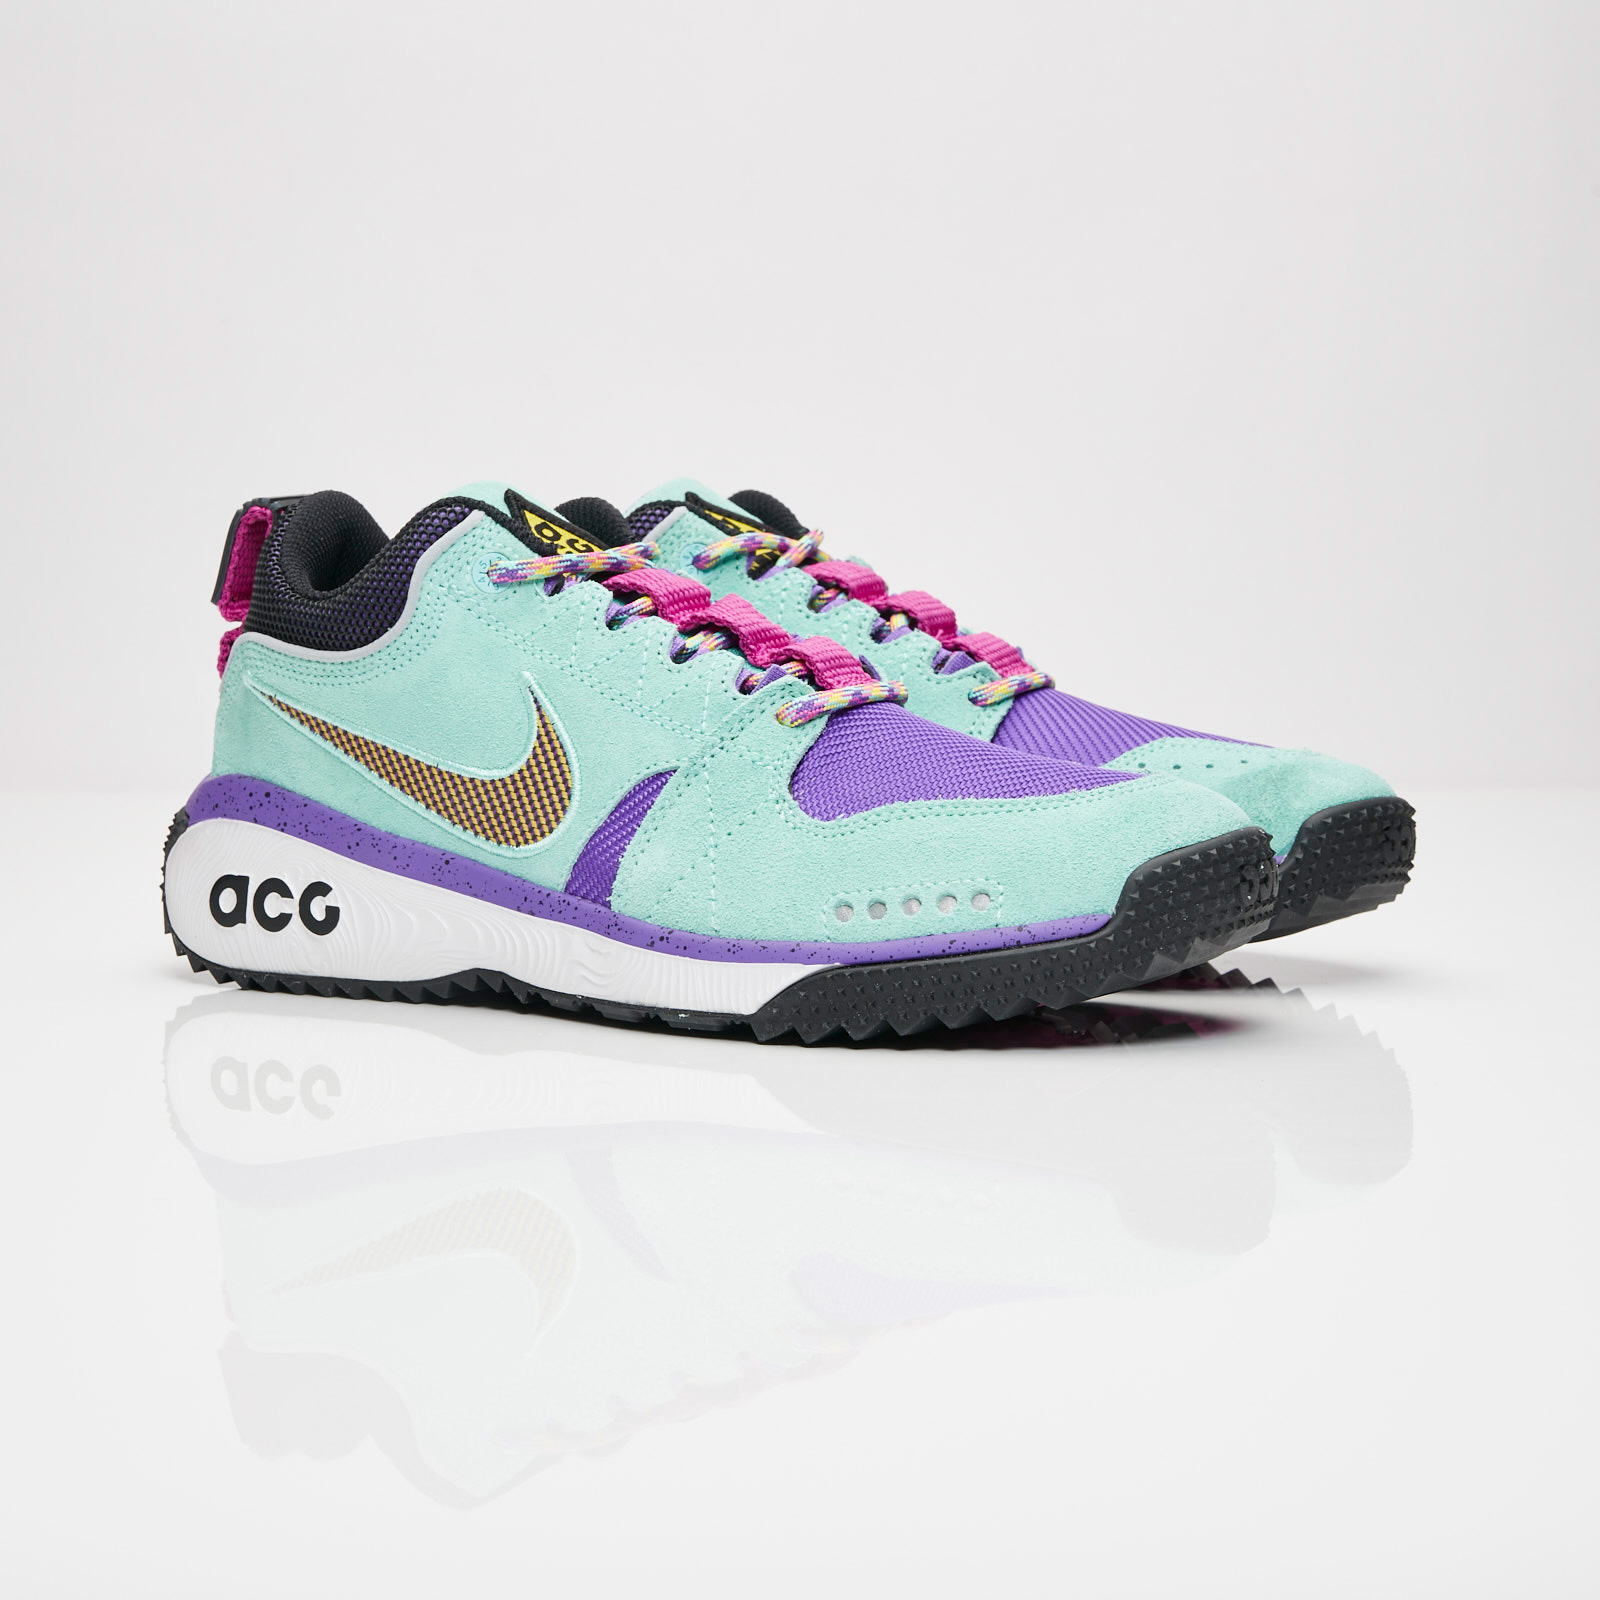 d2eab8e8113d4 Nike ACG Dog Mountain - Aq0916-300 - Sneakersnstuff